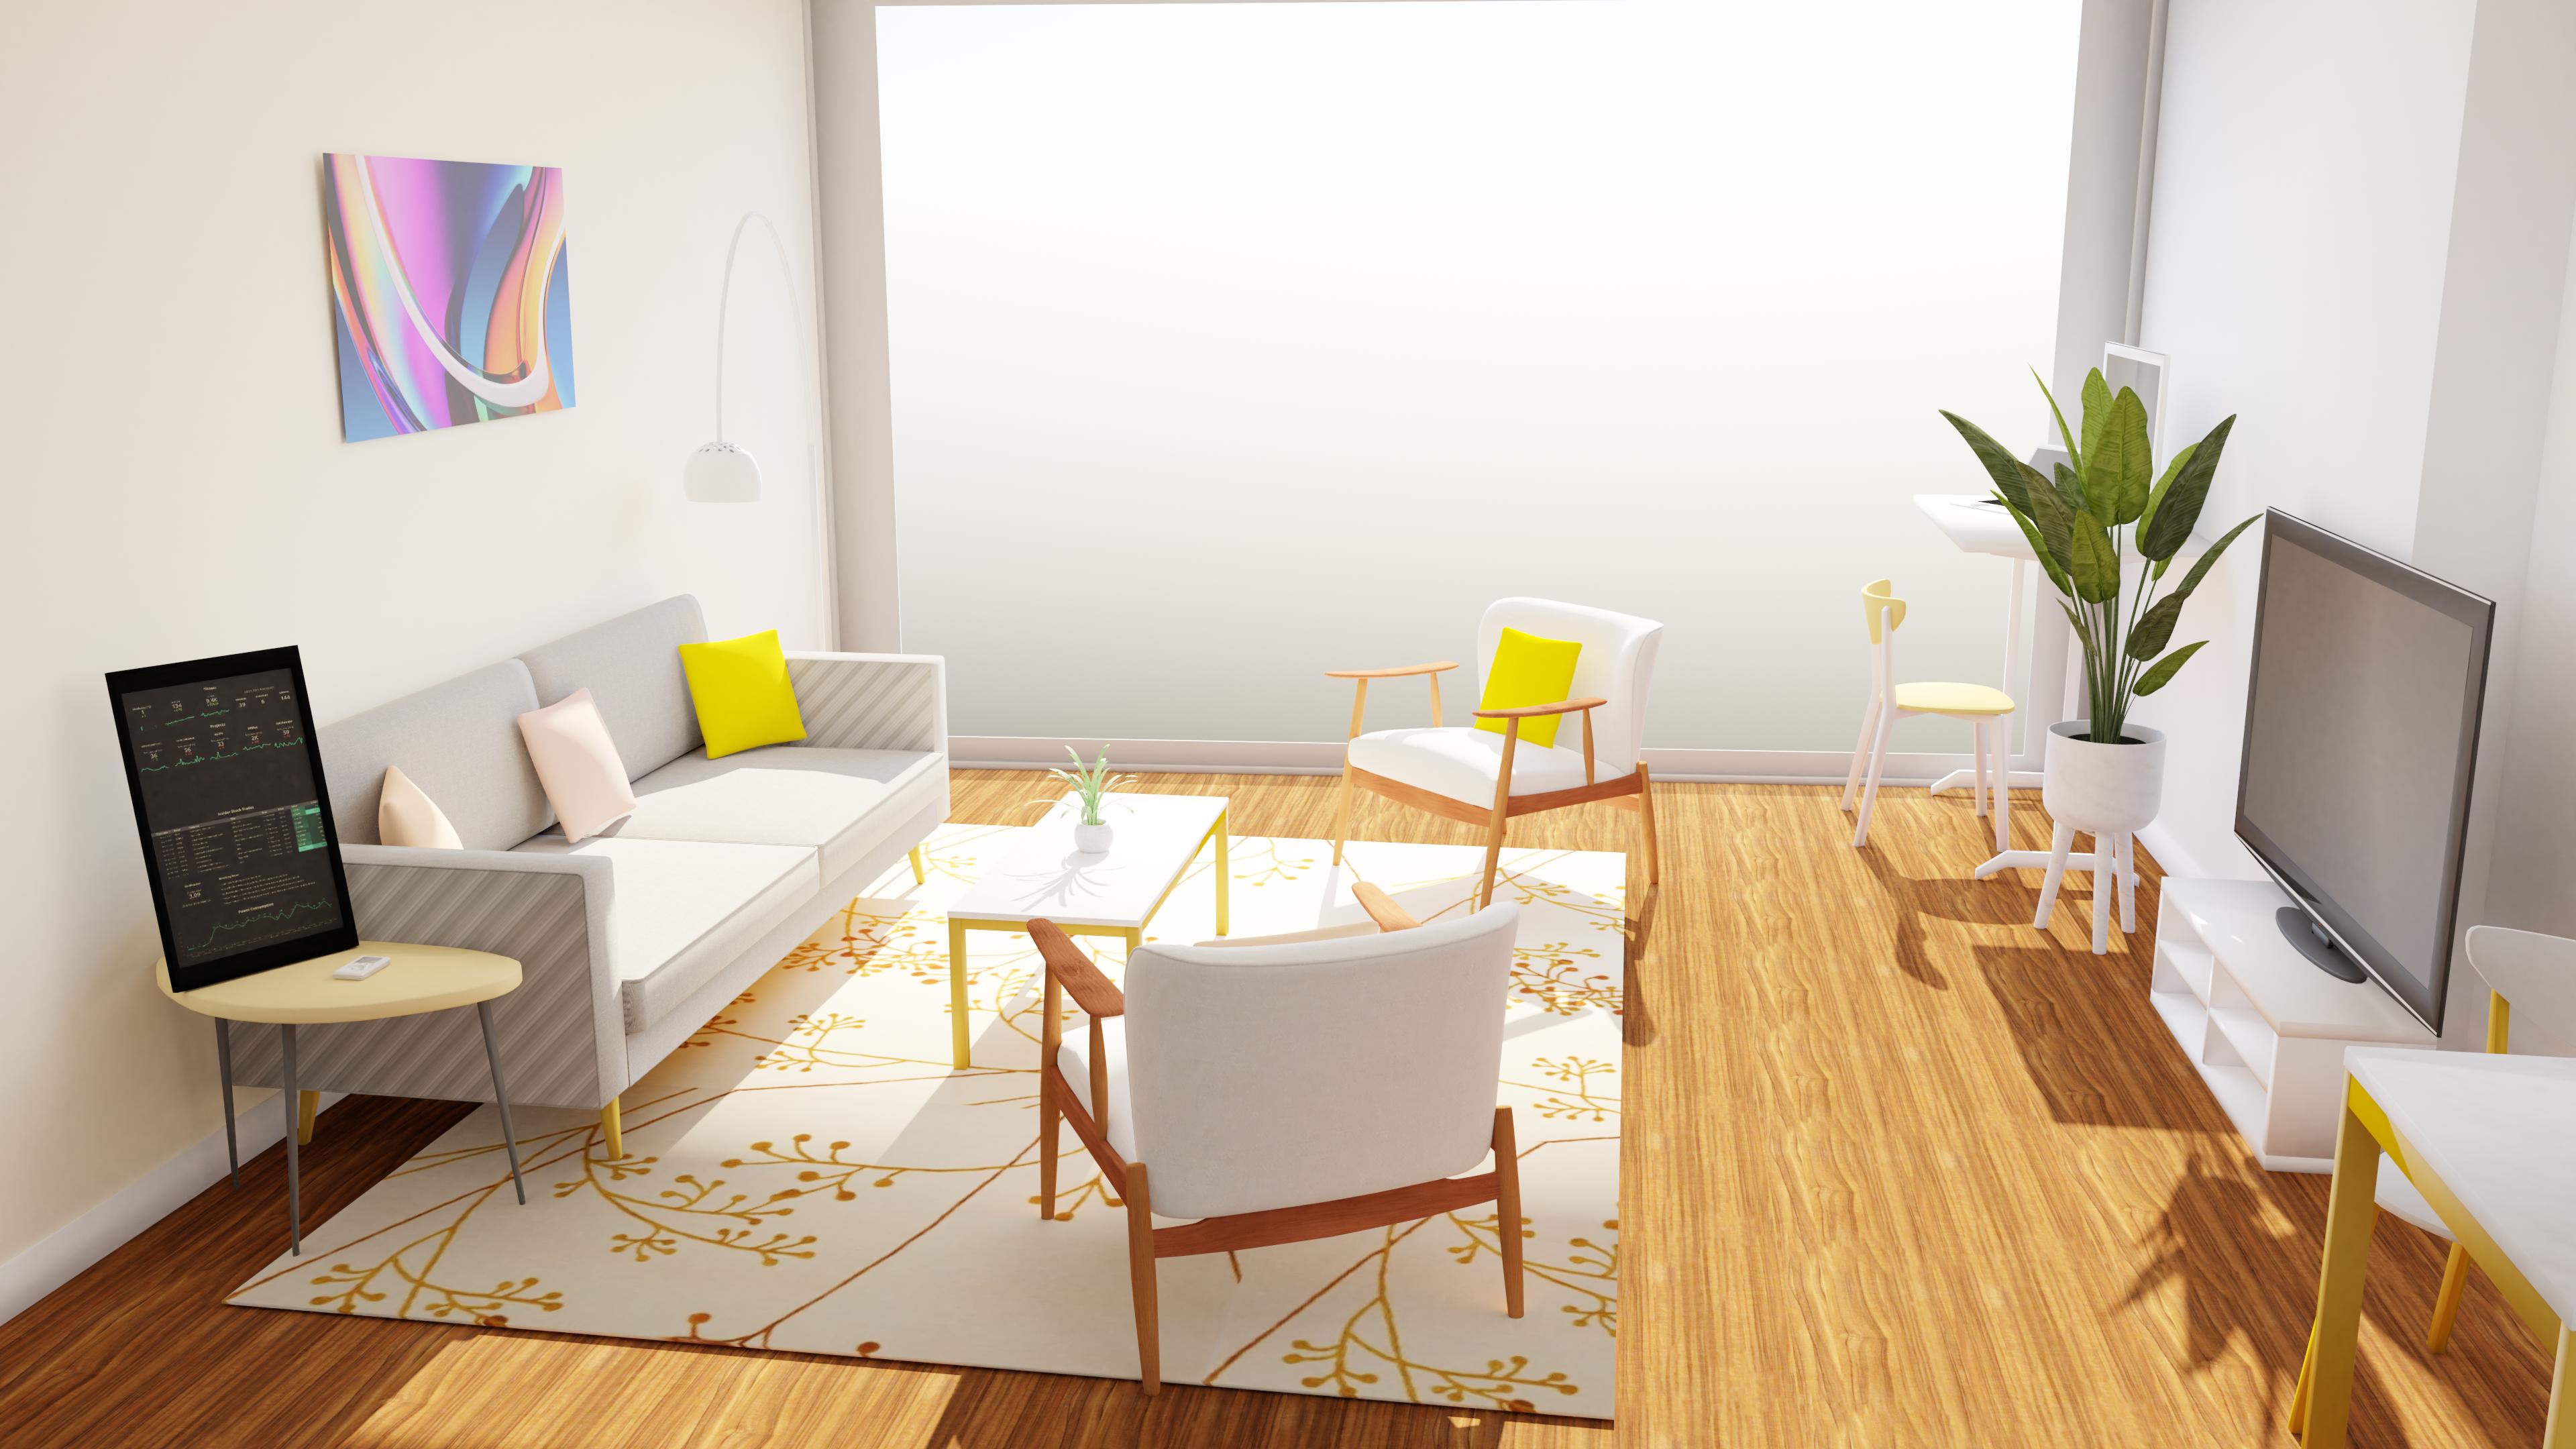 Living room render in Blender